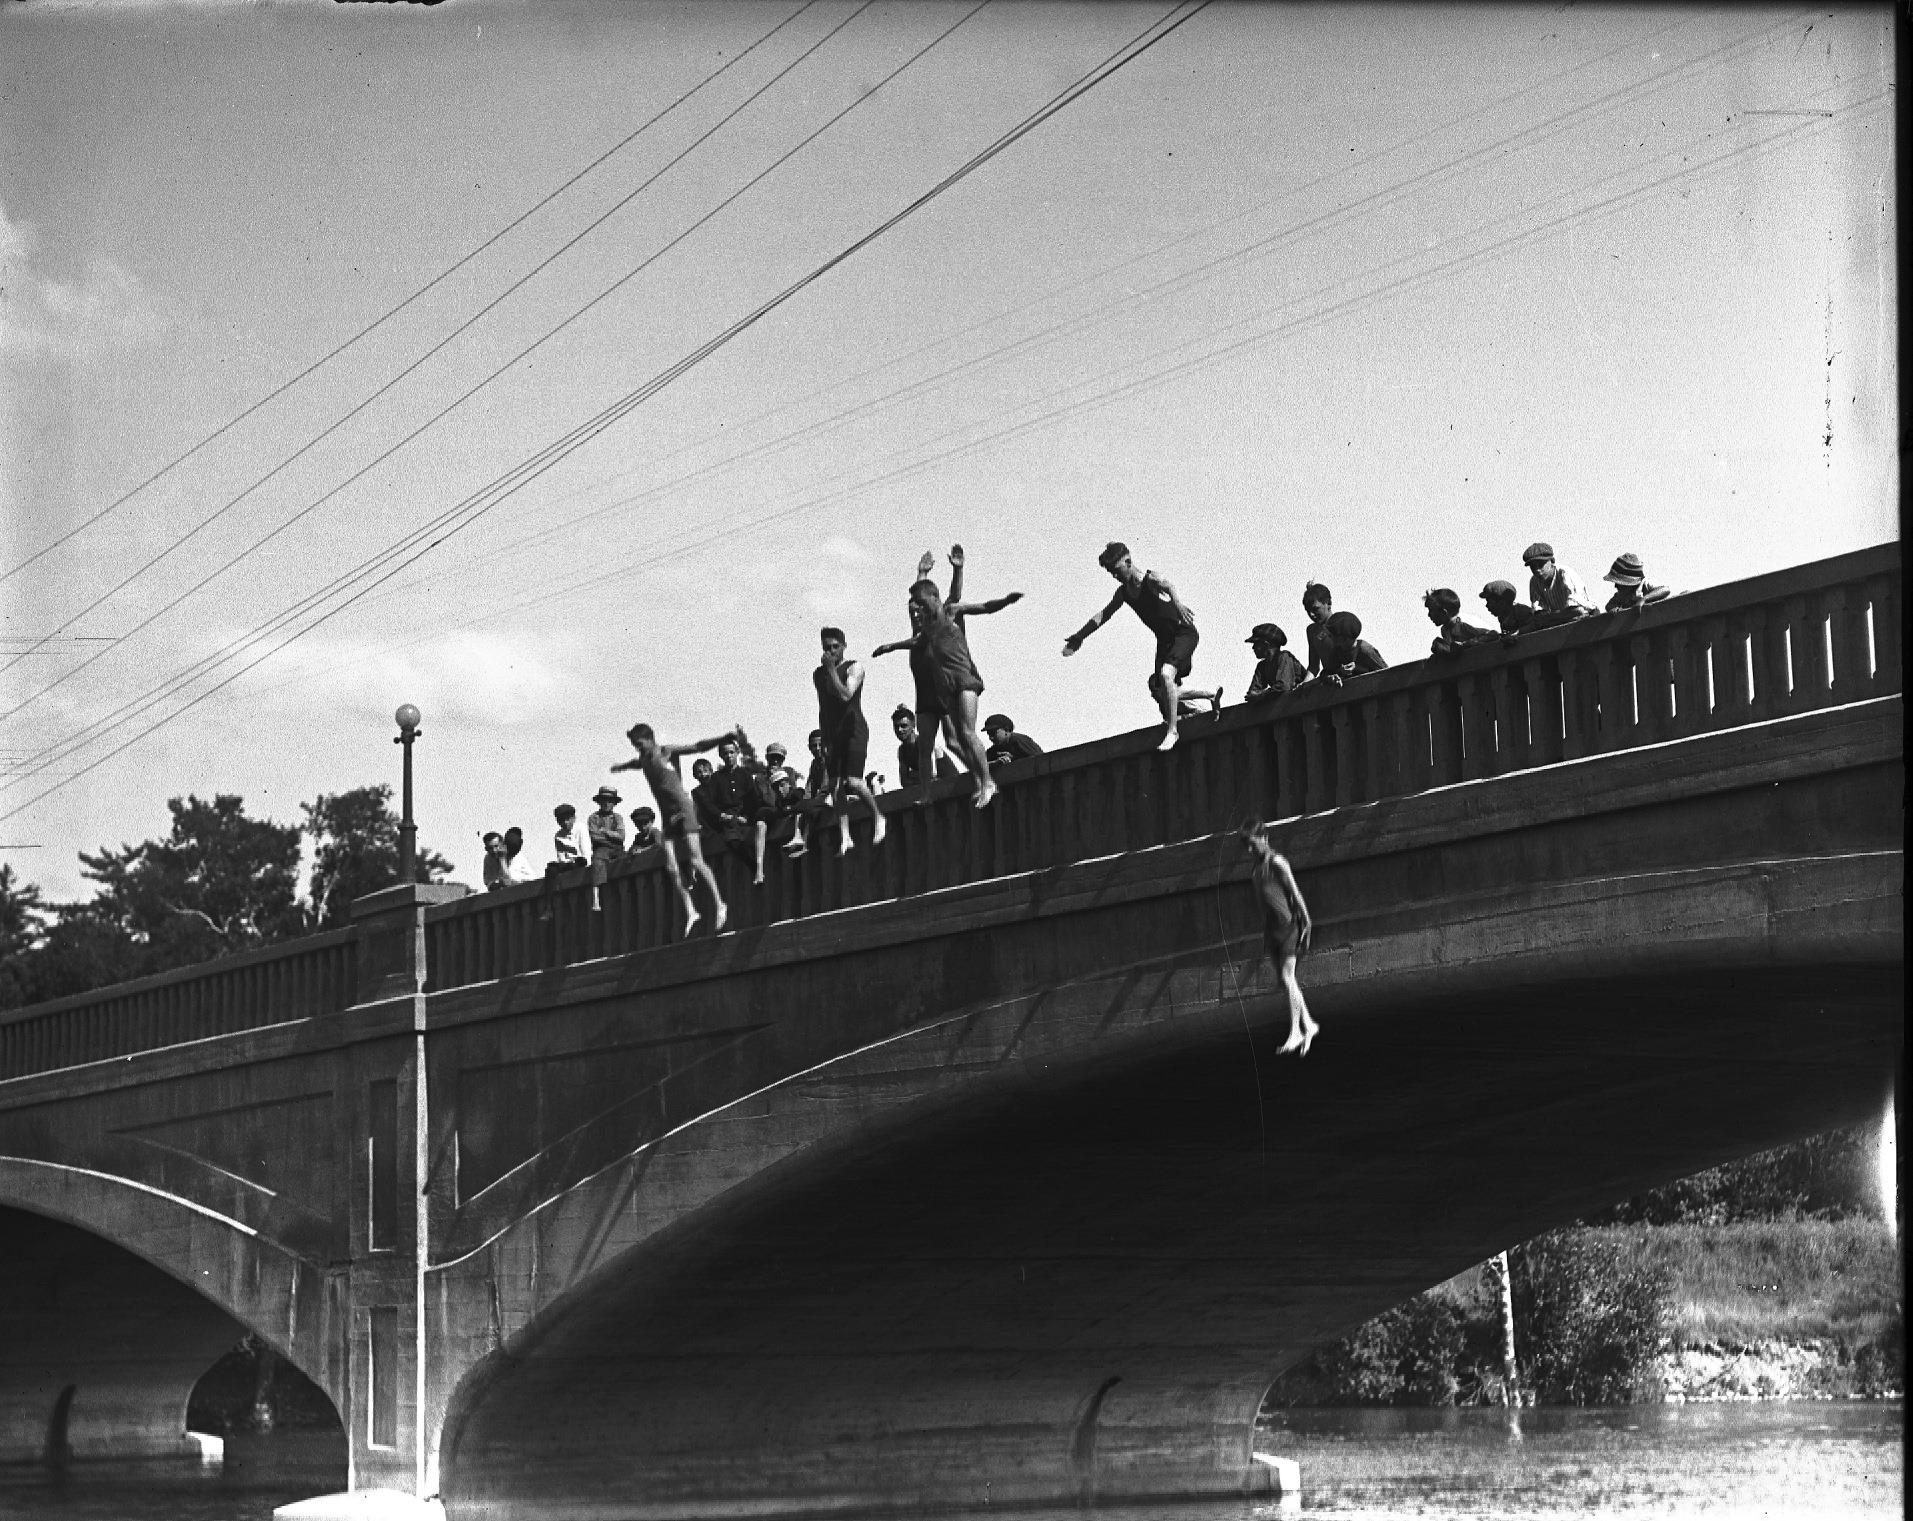 Boys jumping off Inverlea Bridge 1930s-40s Photo credit: Peterborough Museum and Archives